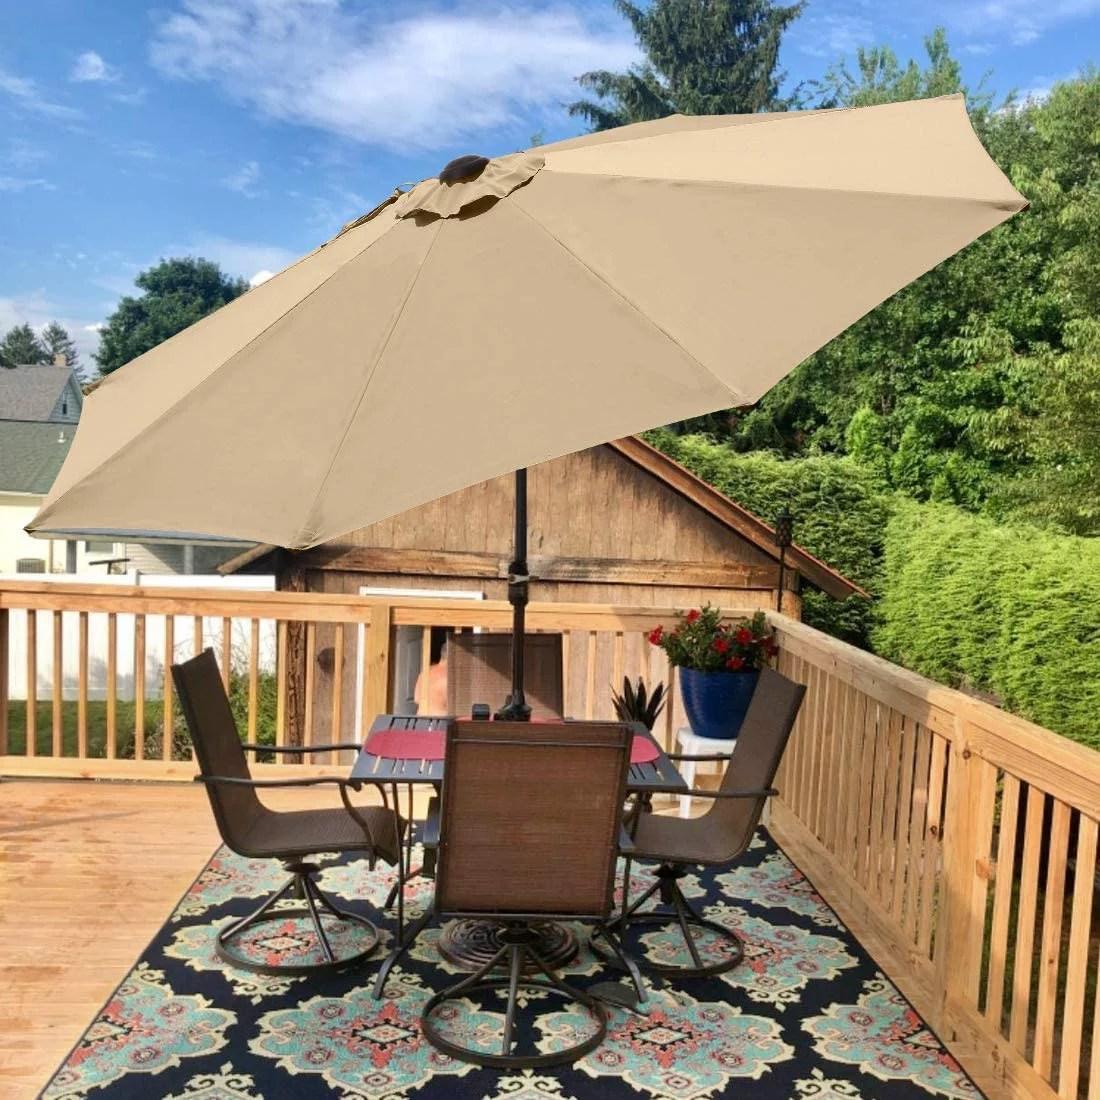 quictent 9ft tan patio umbrella 3 years non fading outdoor garden table canopy market umbrella pool backyard with ventilation top 8 ribs 240g